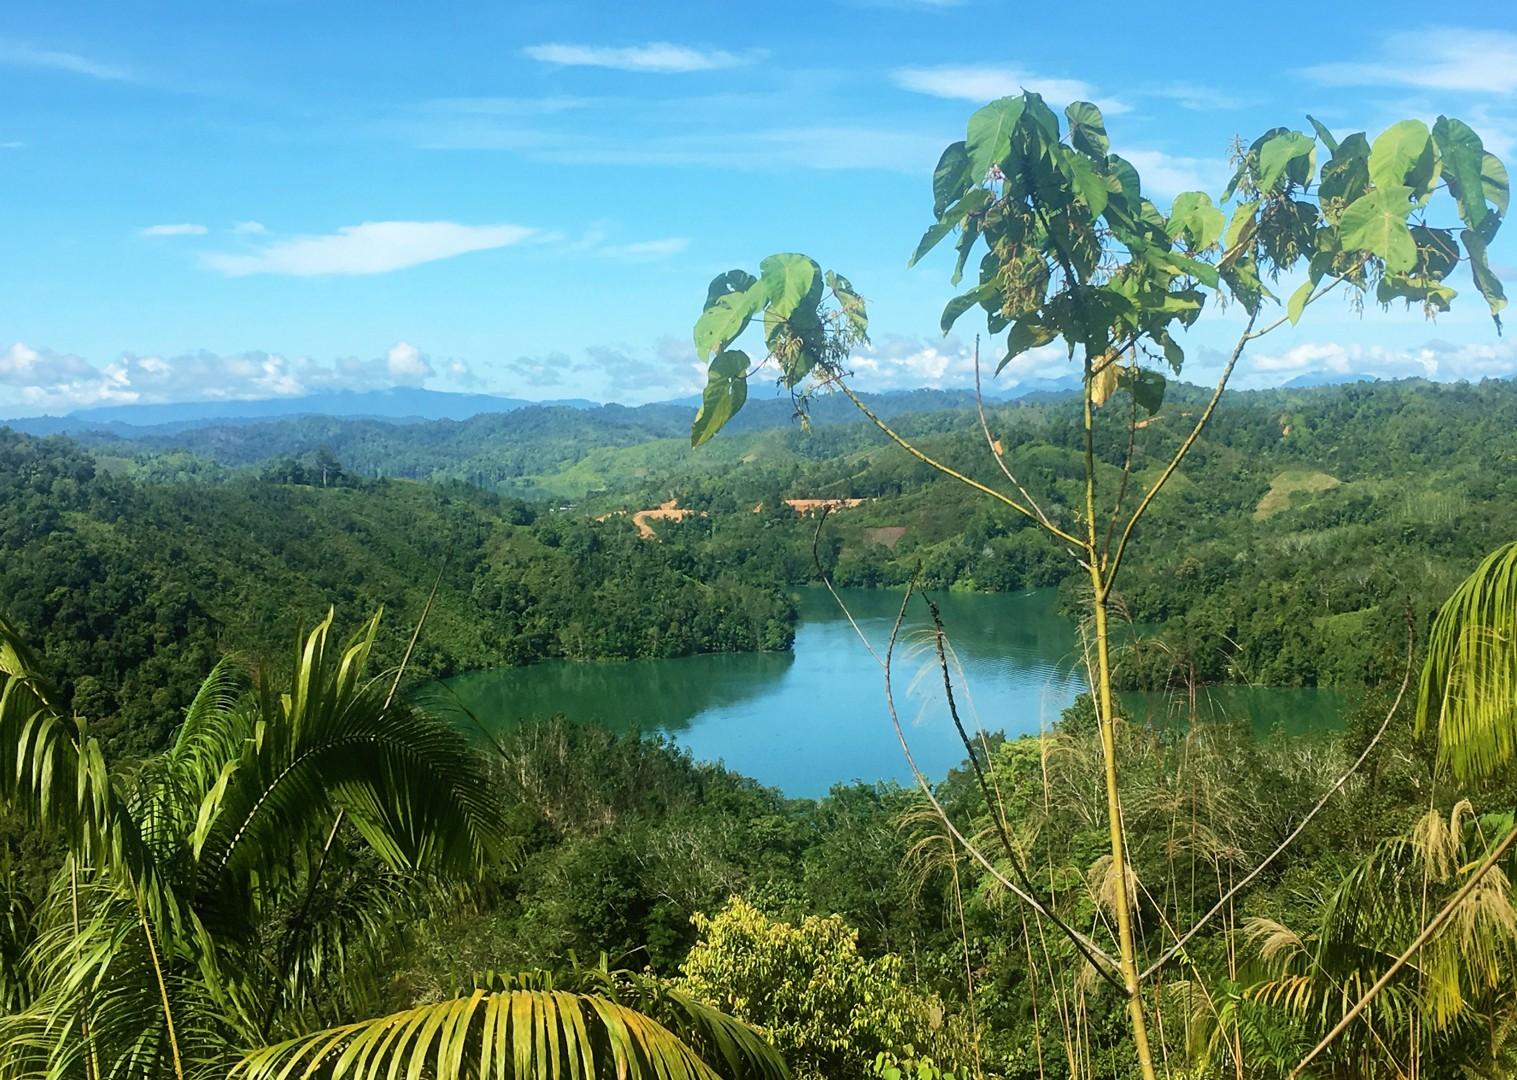 jungle-view-borneo-trip-on-bikes.jpg - NEW! Borneo - Secret Sarawak - Cycling Adventures